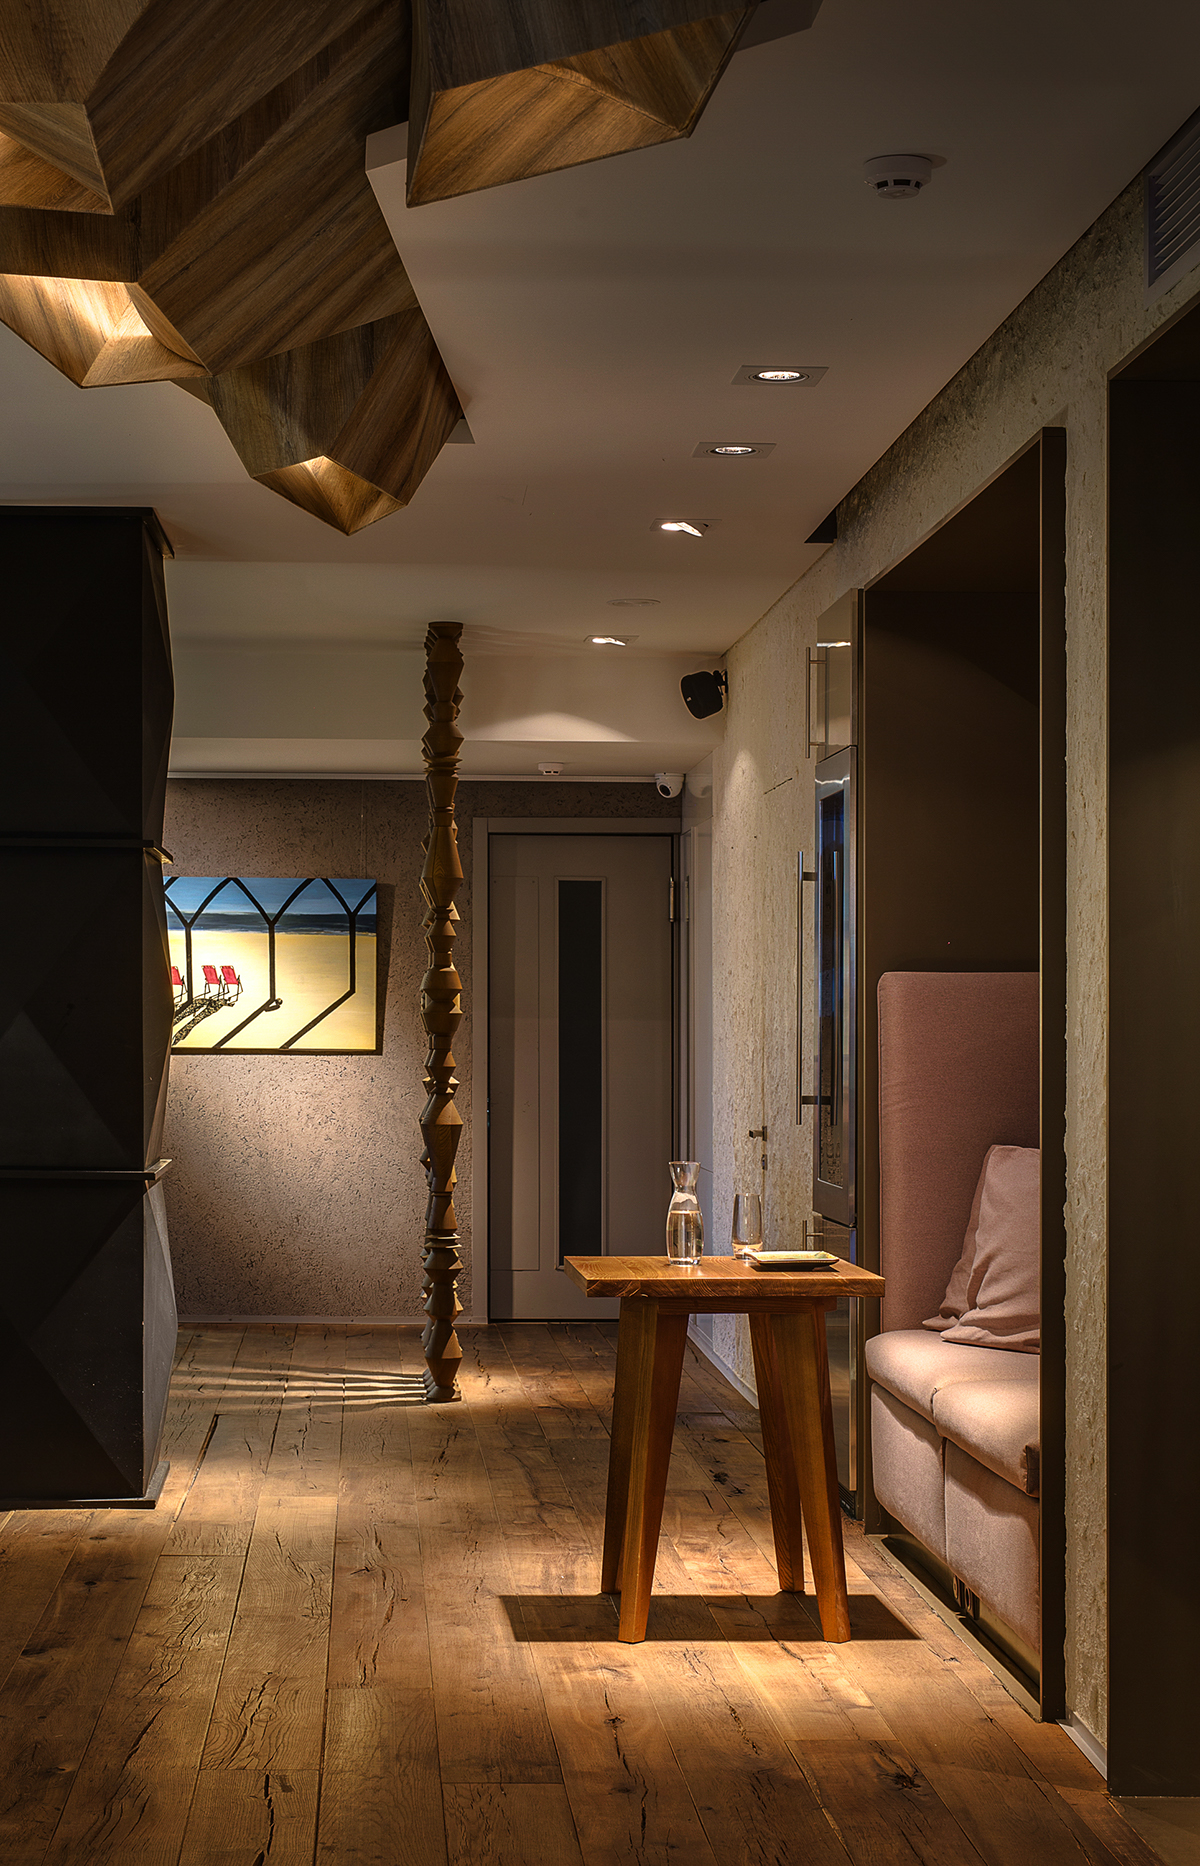 kiev ukraine balbek 2bgroup restaurant Interior natural design